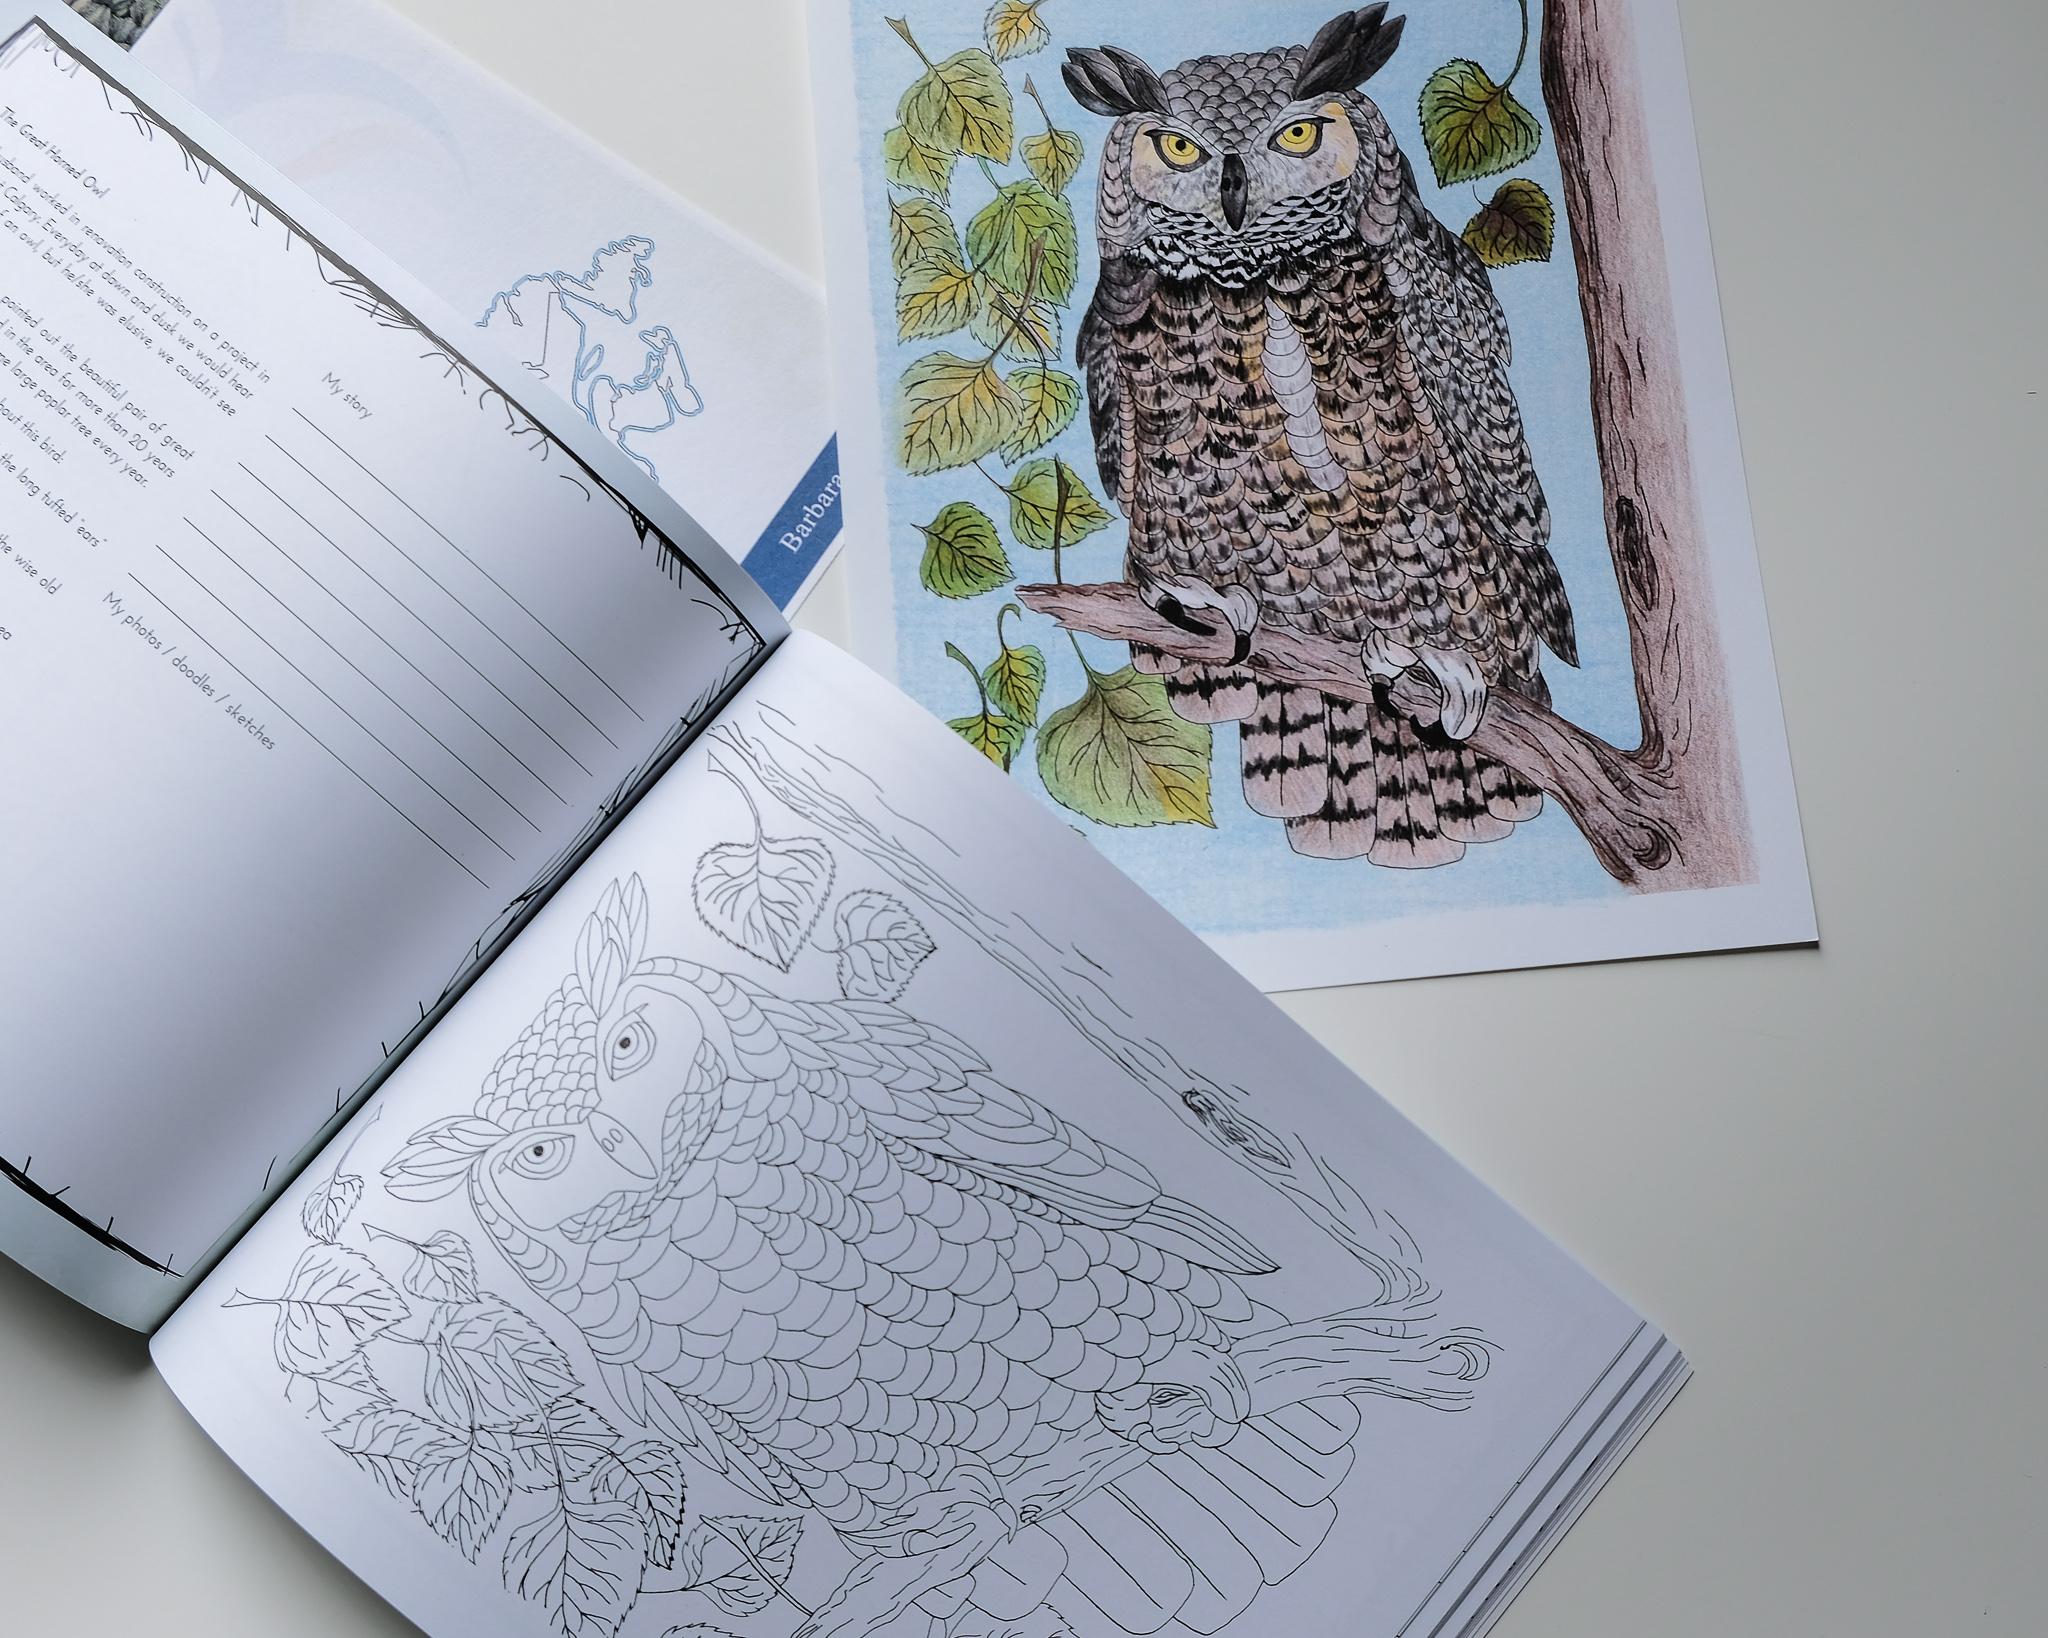 Alberta Owl - Sights of Canada